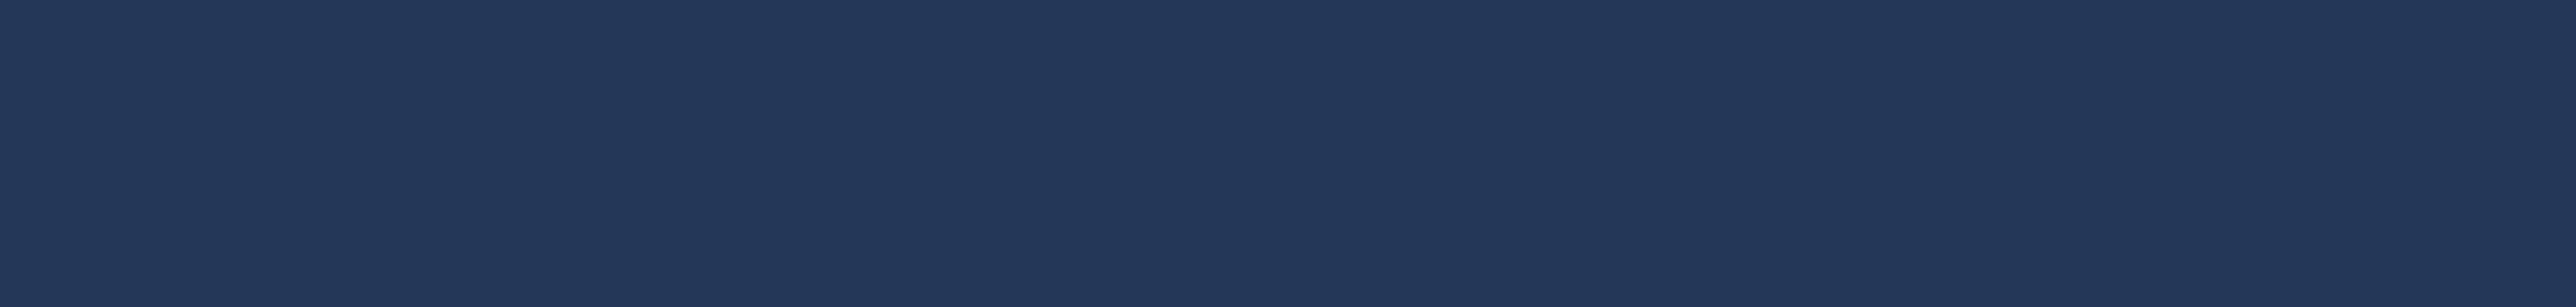 Logotipo de AppDynamics